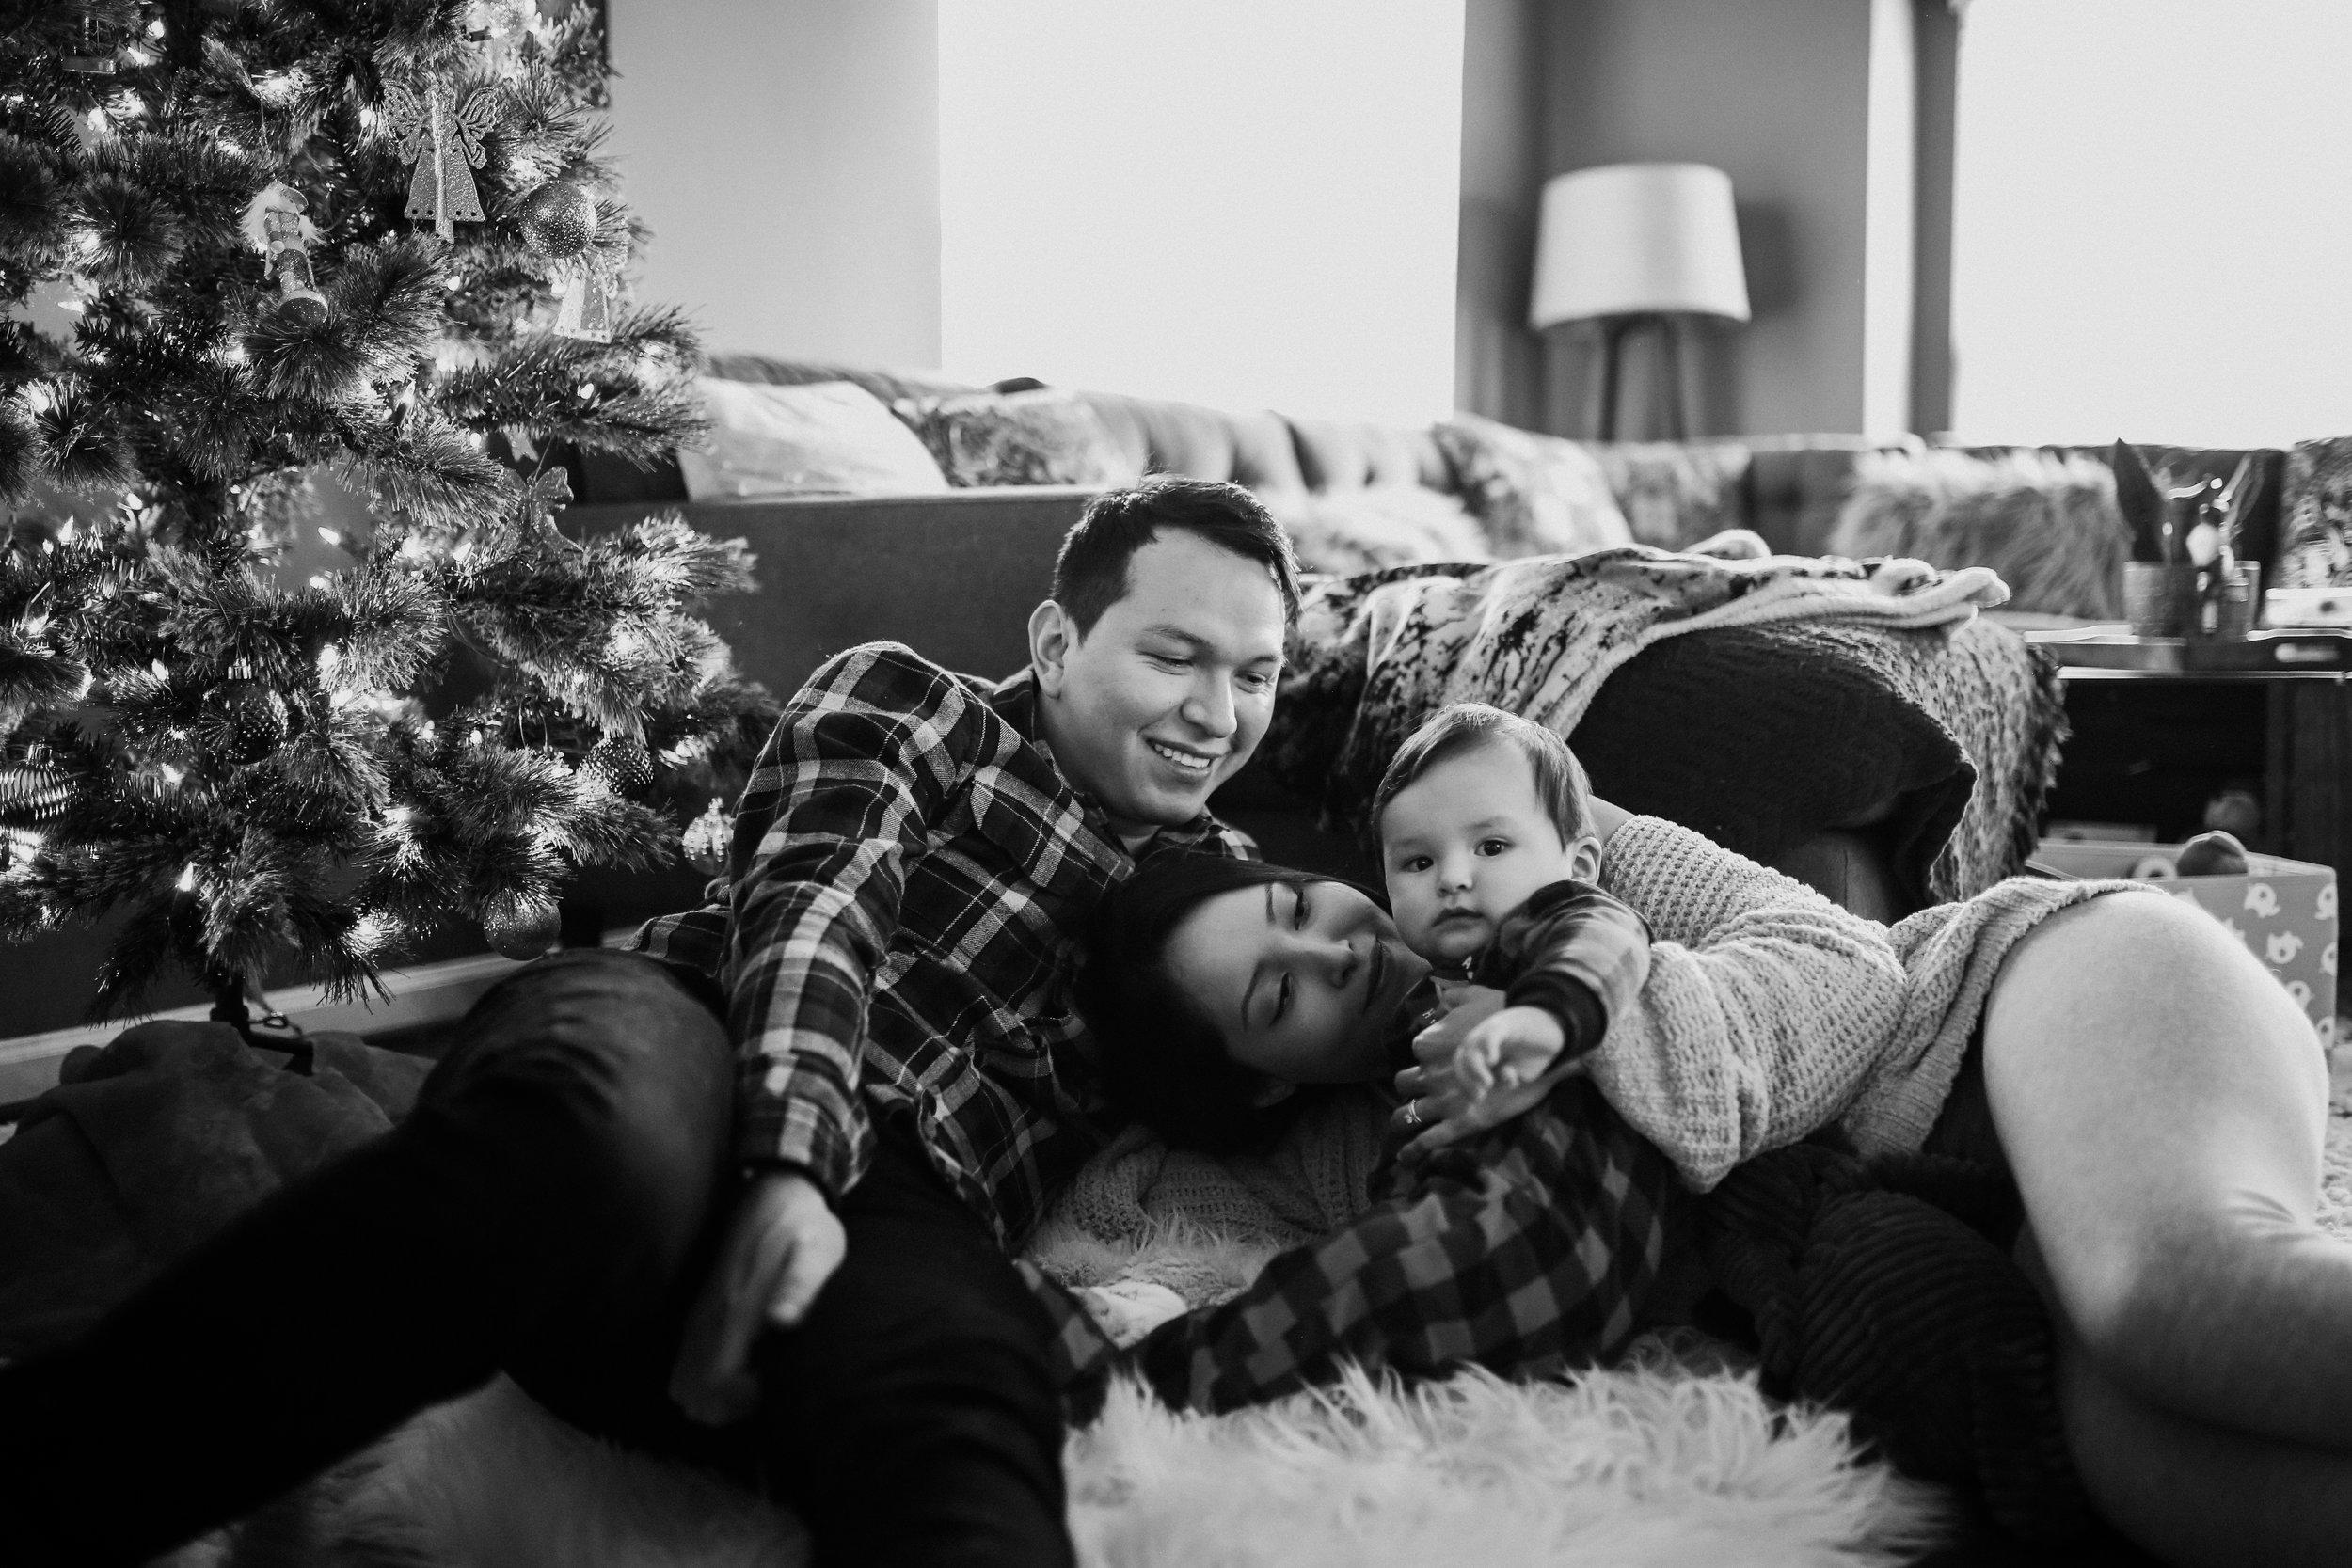 Camacho's_Christmas_2018-16.jpg